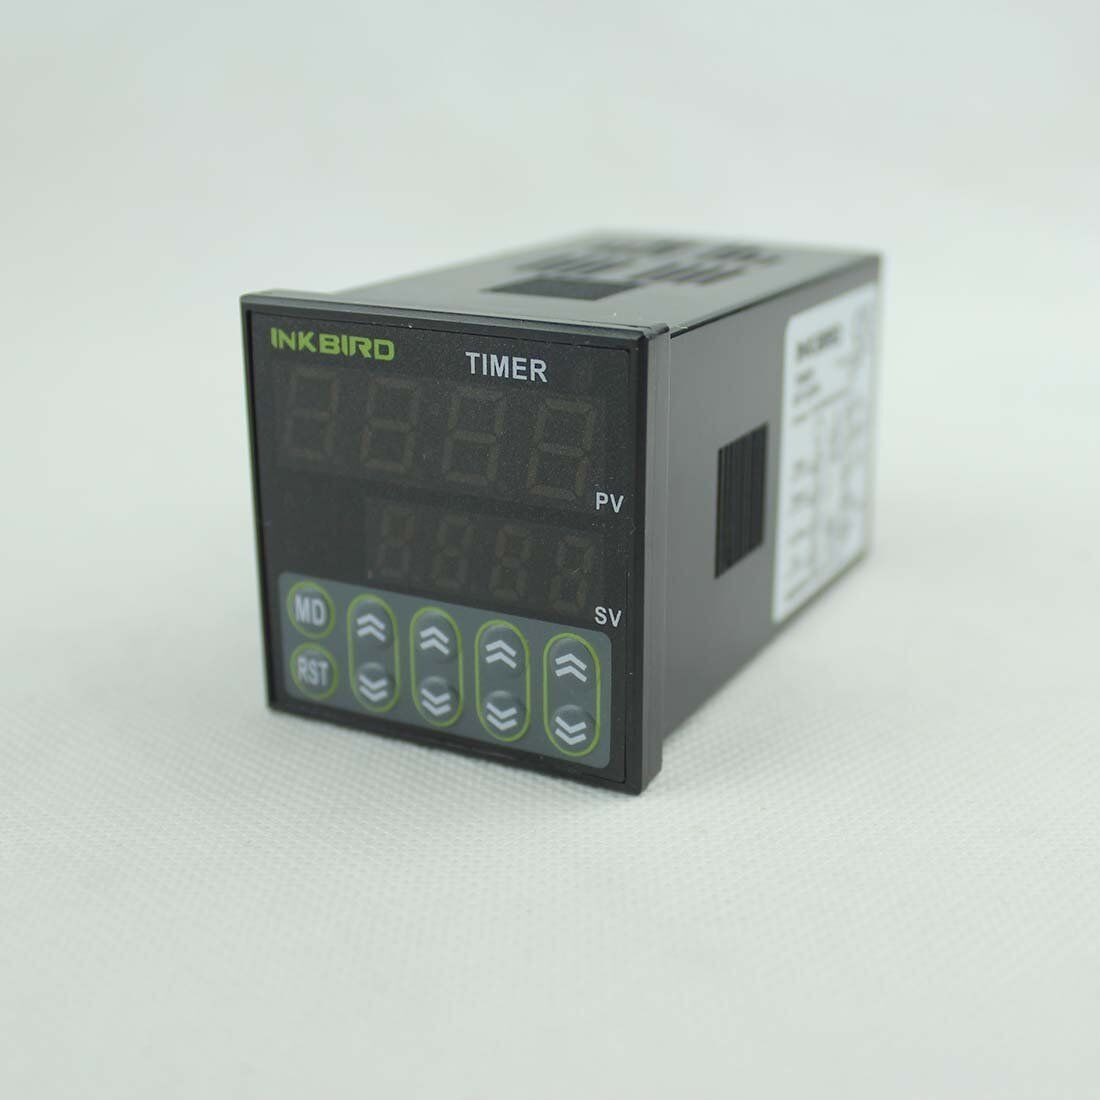 s l1600 inkbird idt e2rh digital twin timer relay time delay relay switch,Wiring Twin Timer Relay